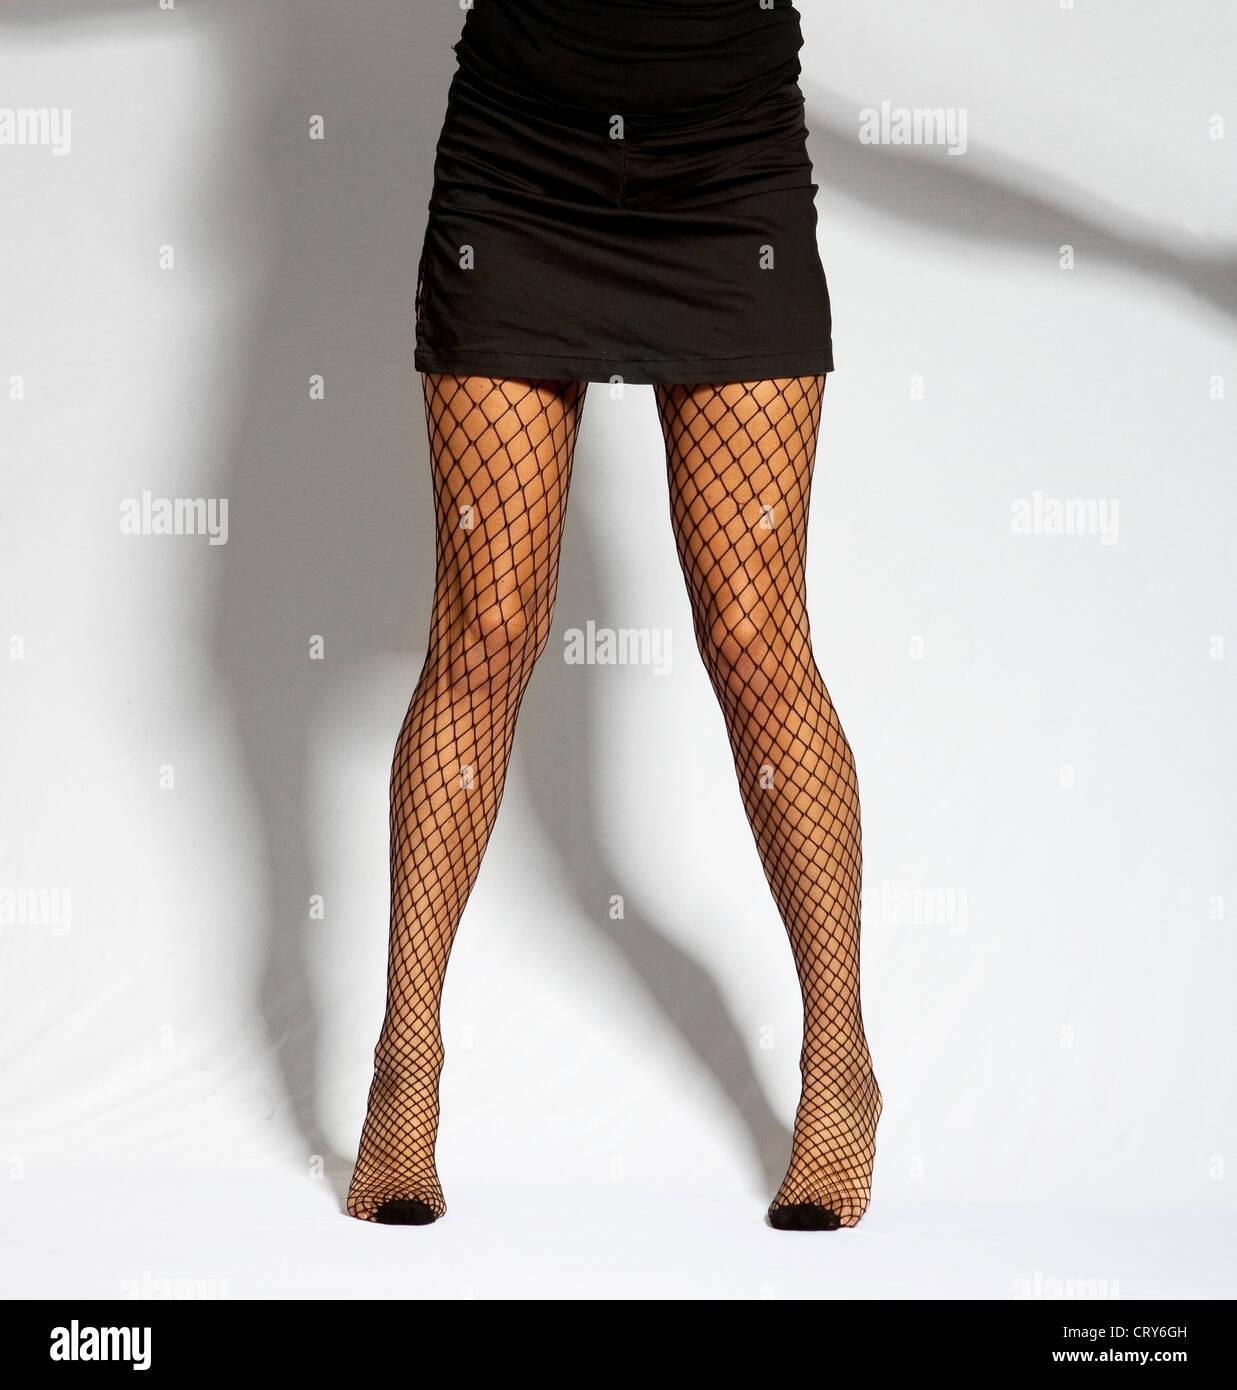 Long shapely legs